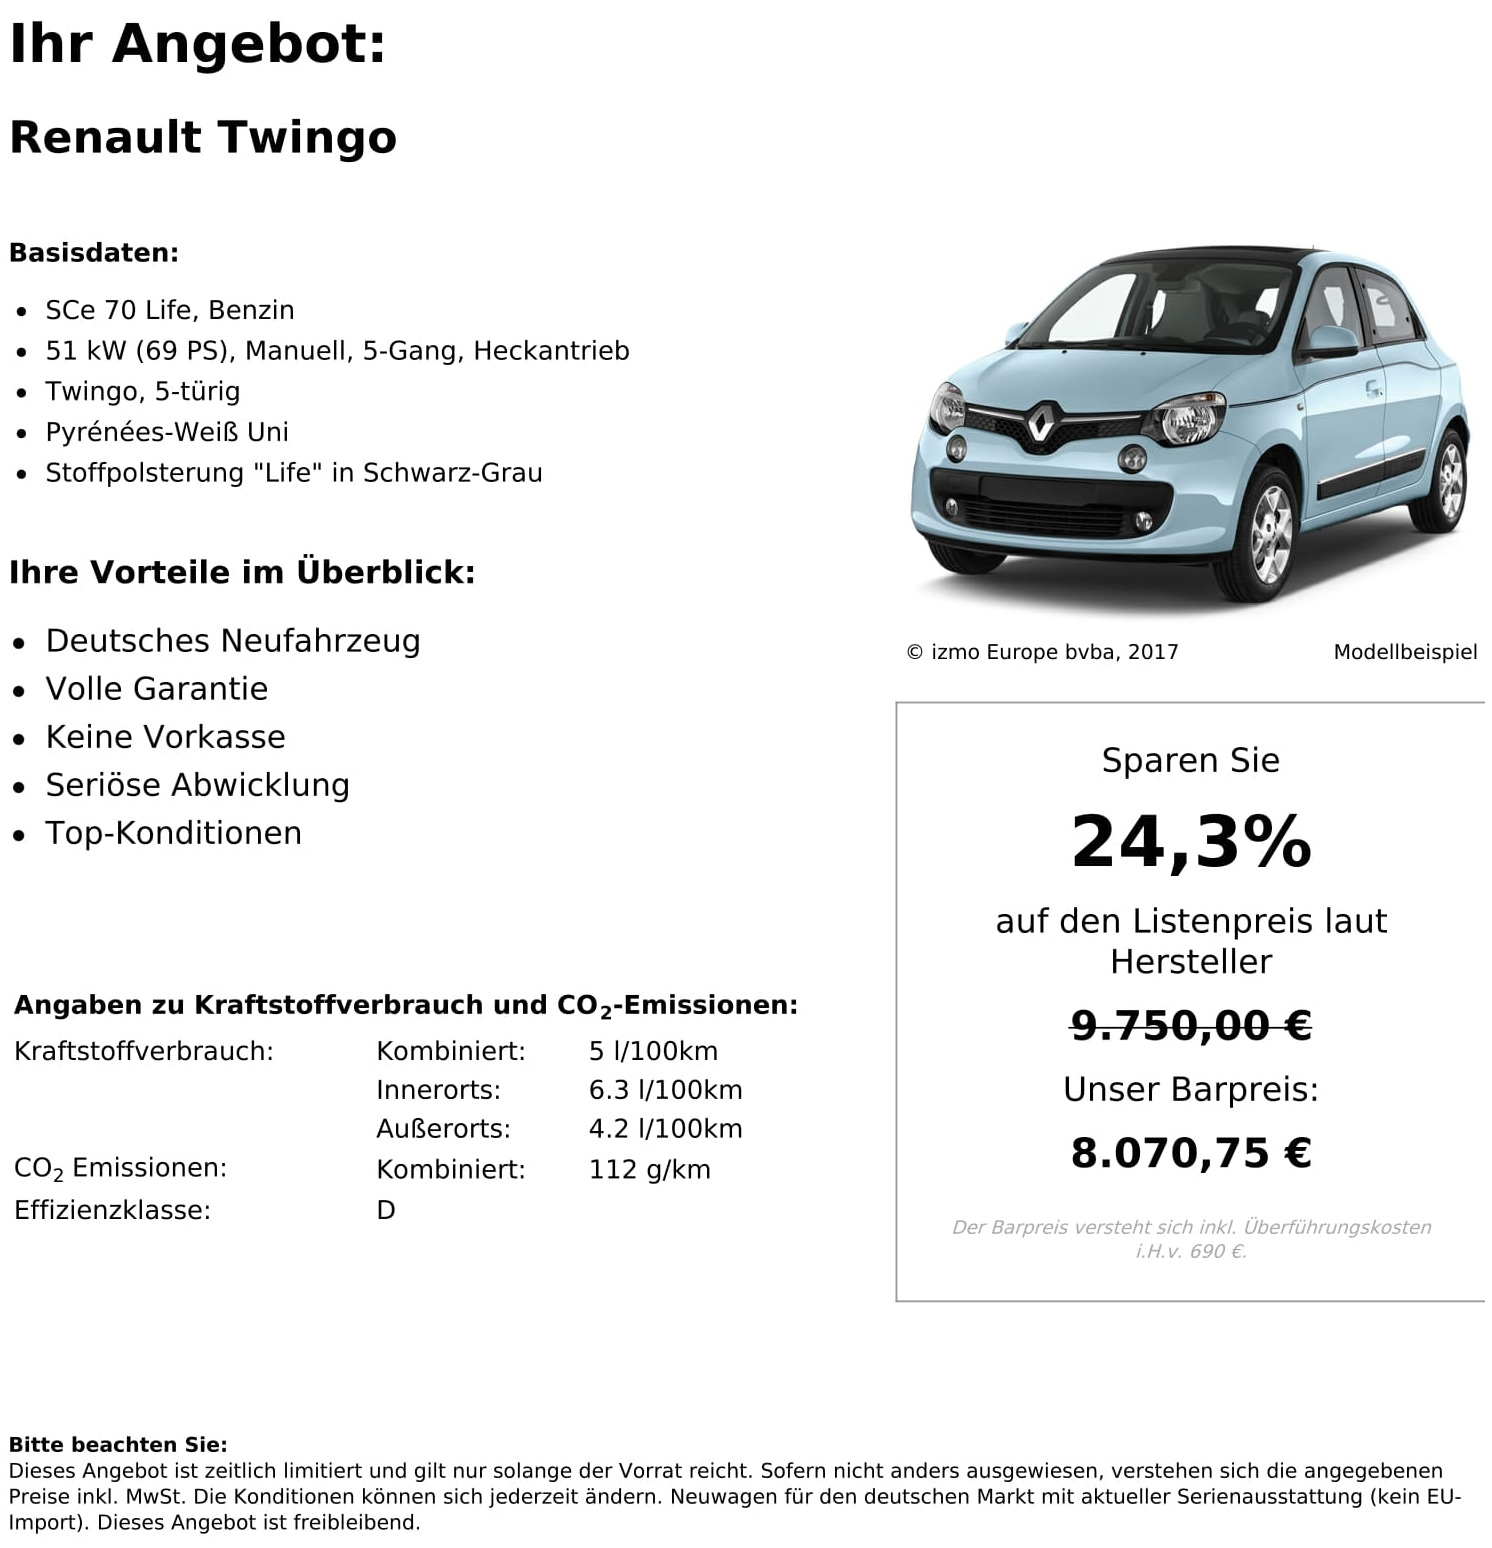 Renault Twingo Neuwagen